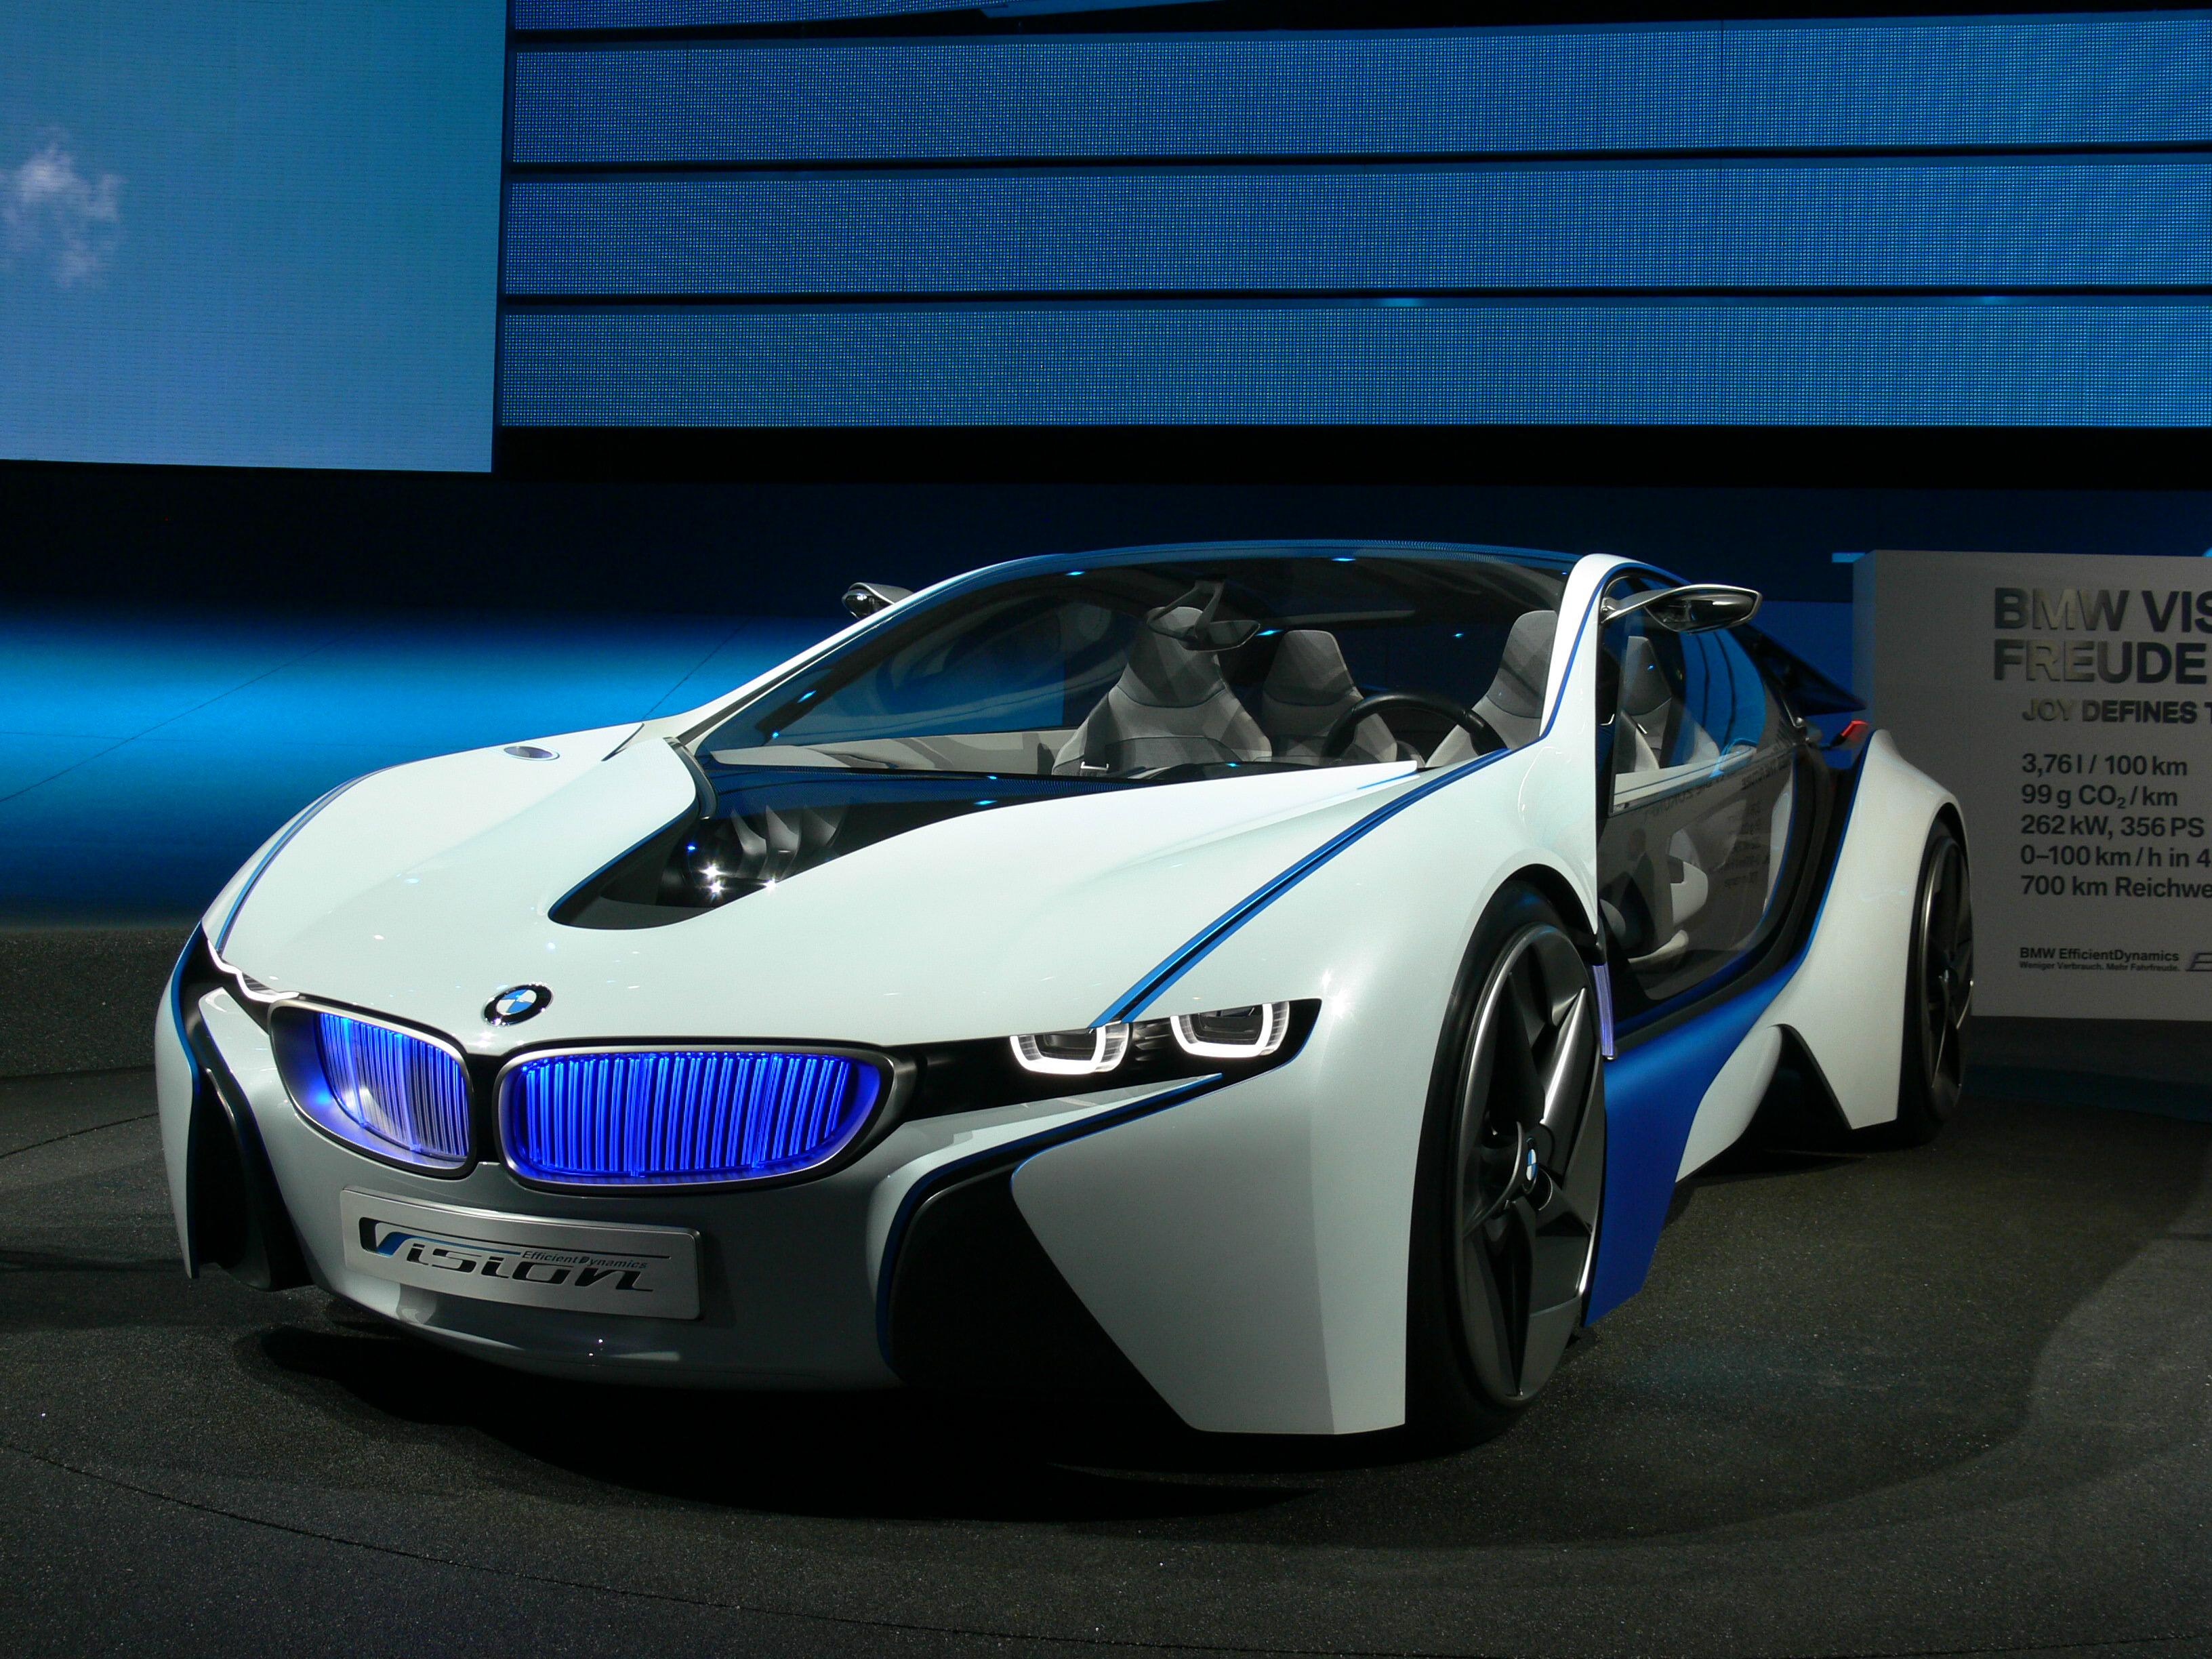 bmw x9 concept vision amazing car. Black Bedroom Furniture Sets. Home Design Ideas